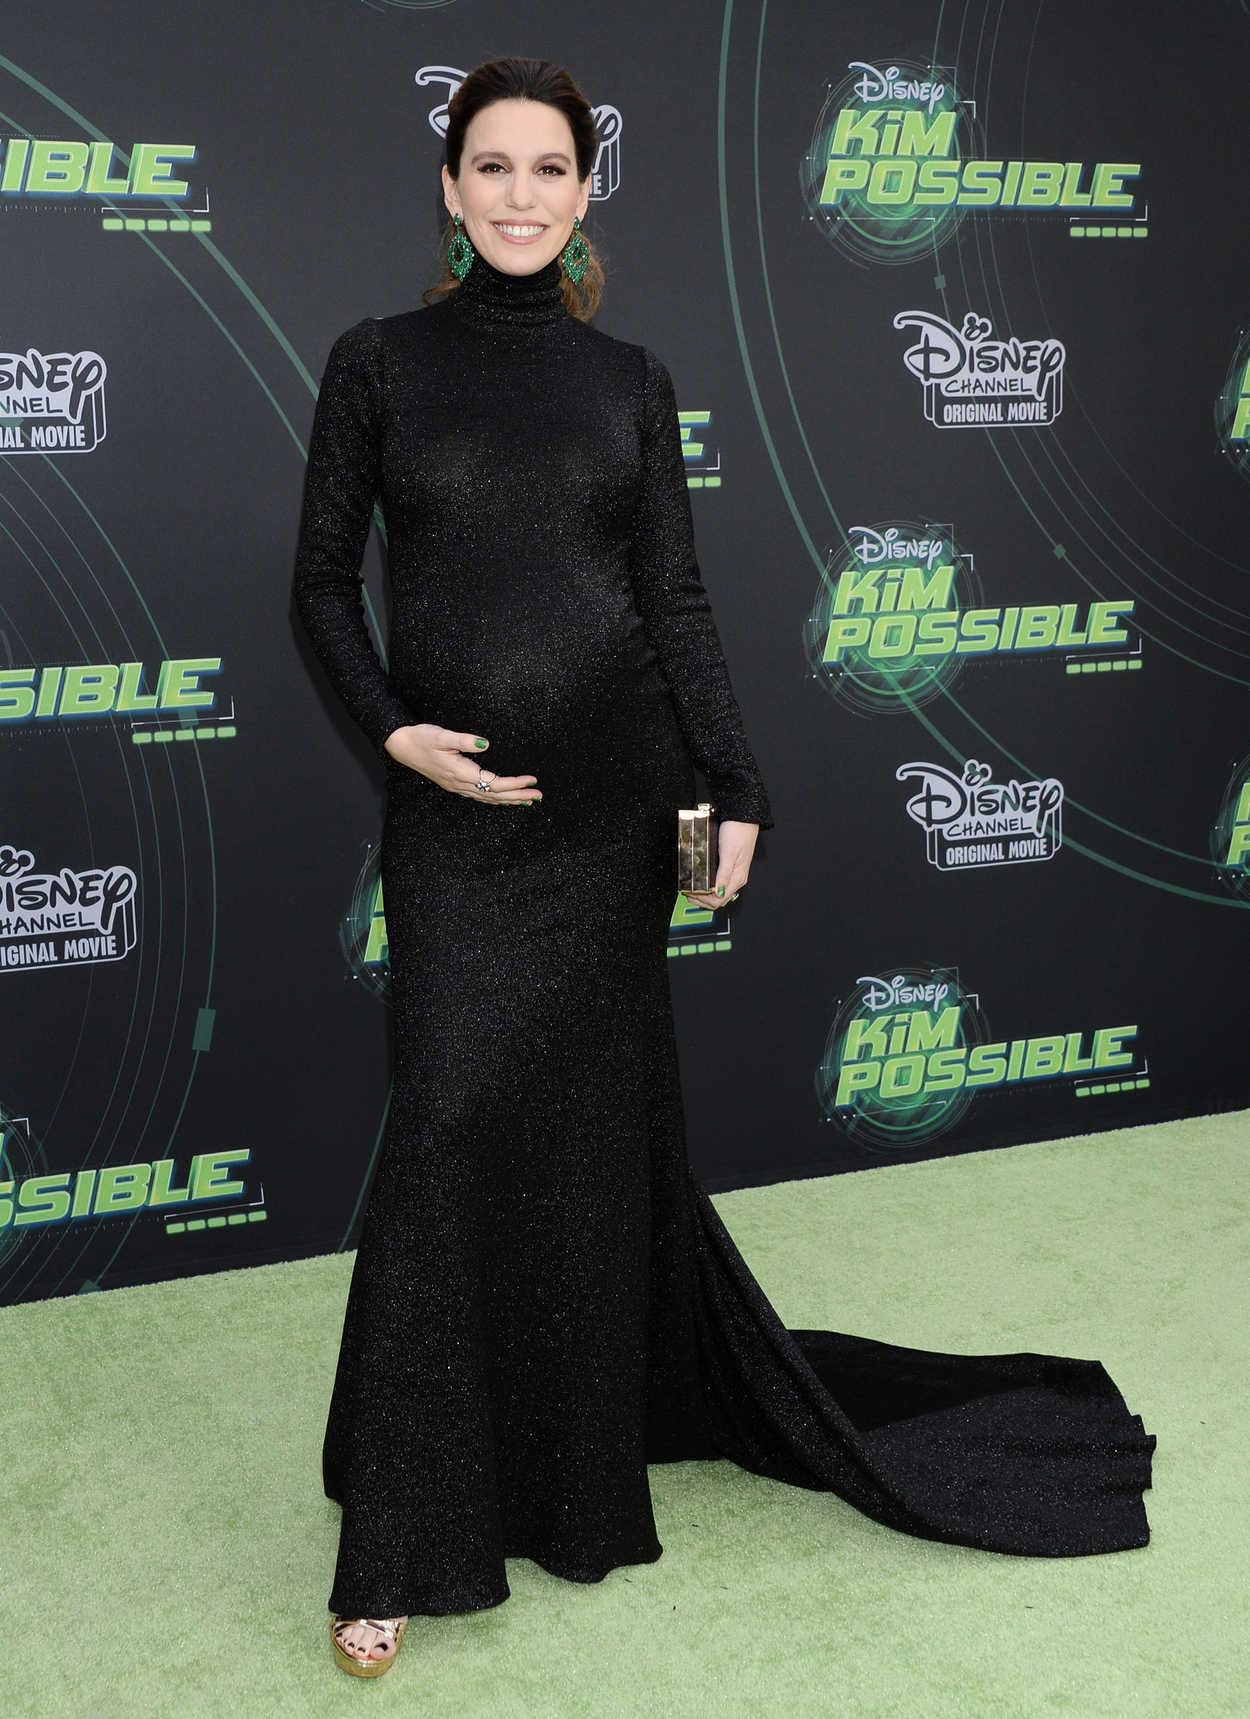 Christy Carlson Romano Attends Kim Possible Premiere